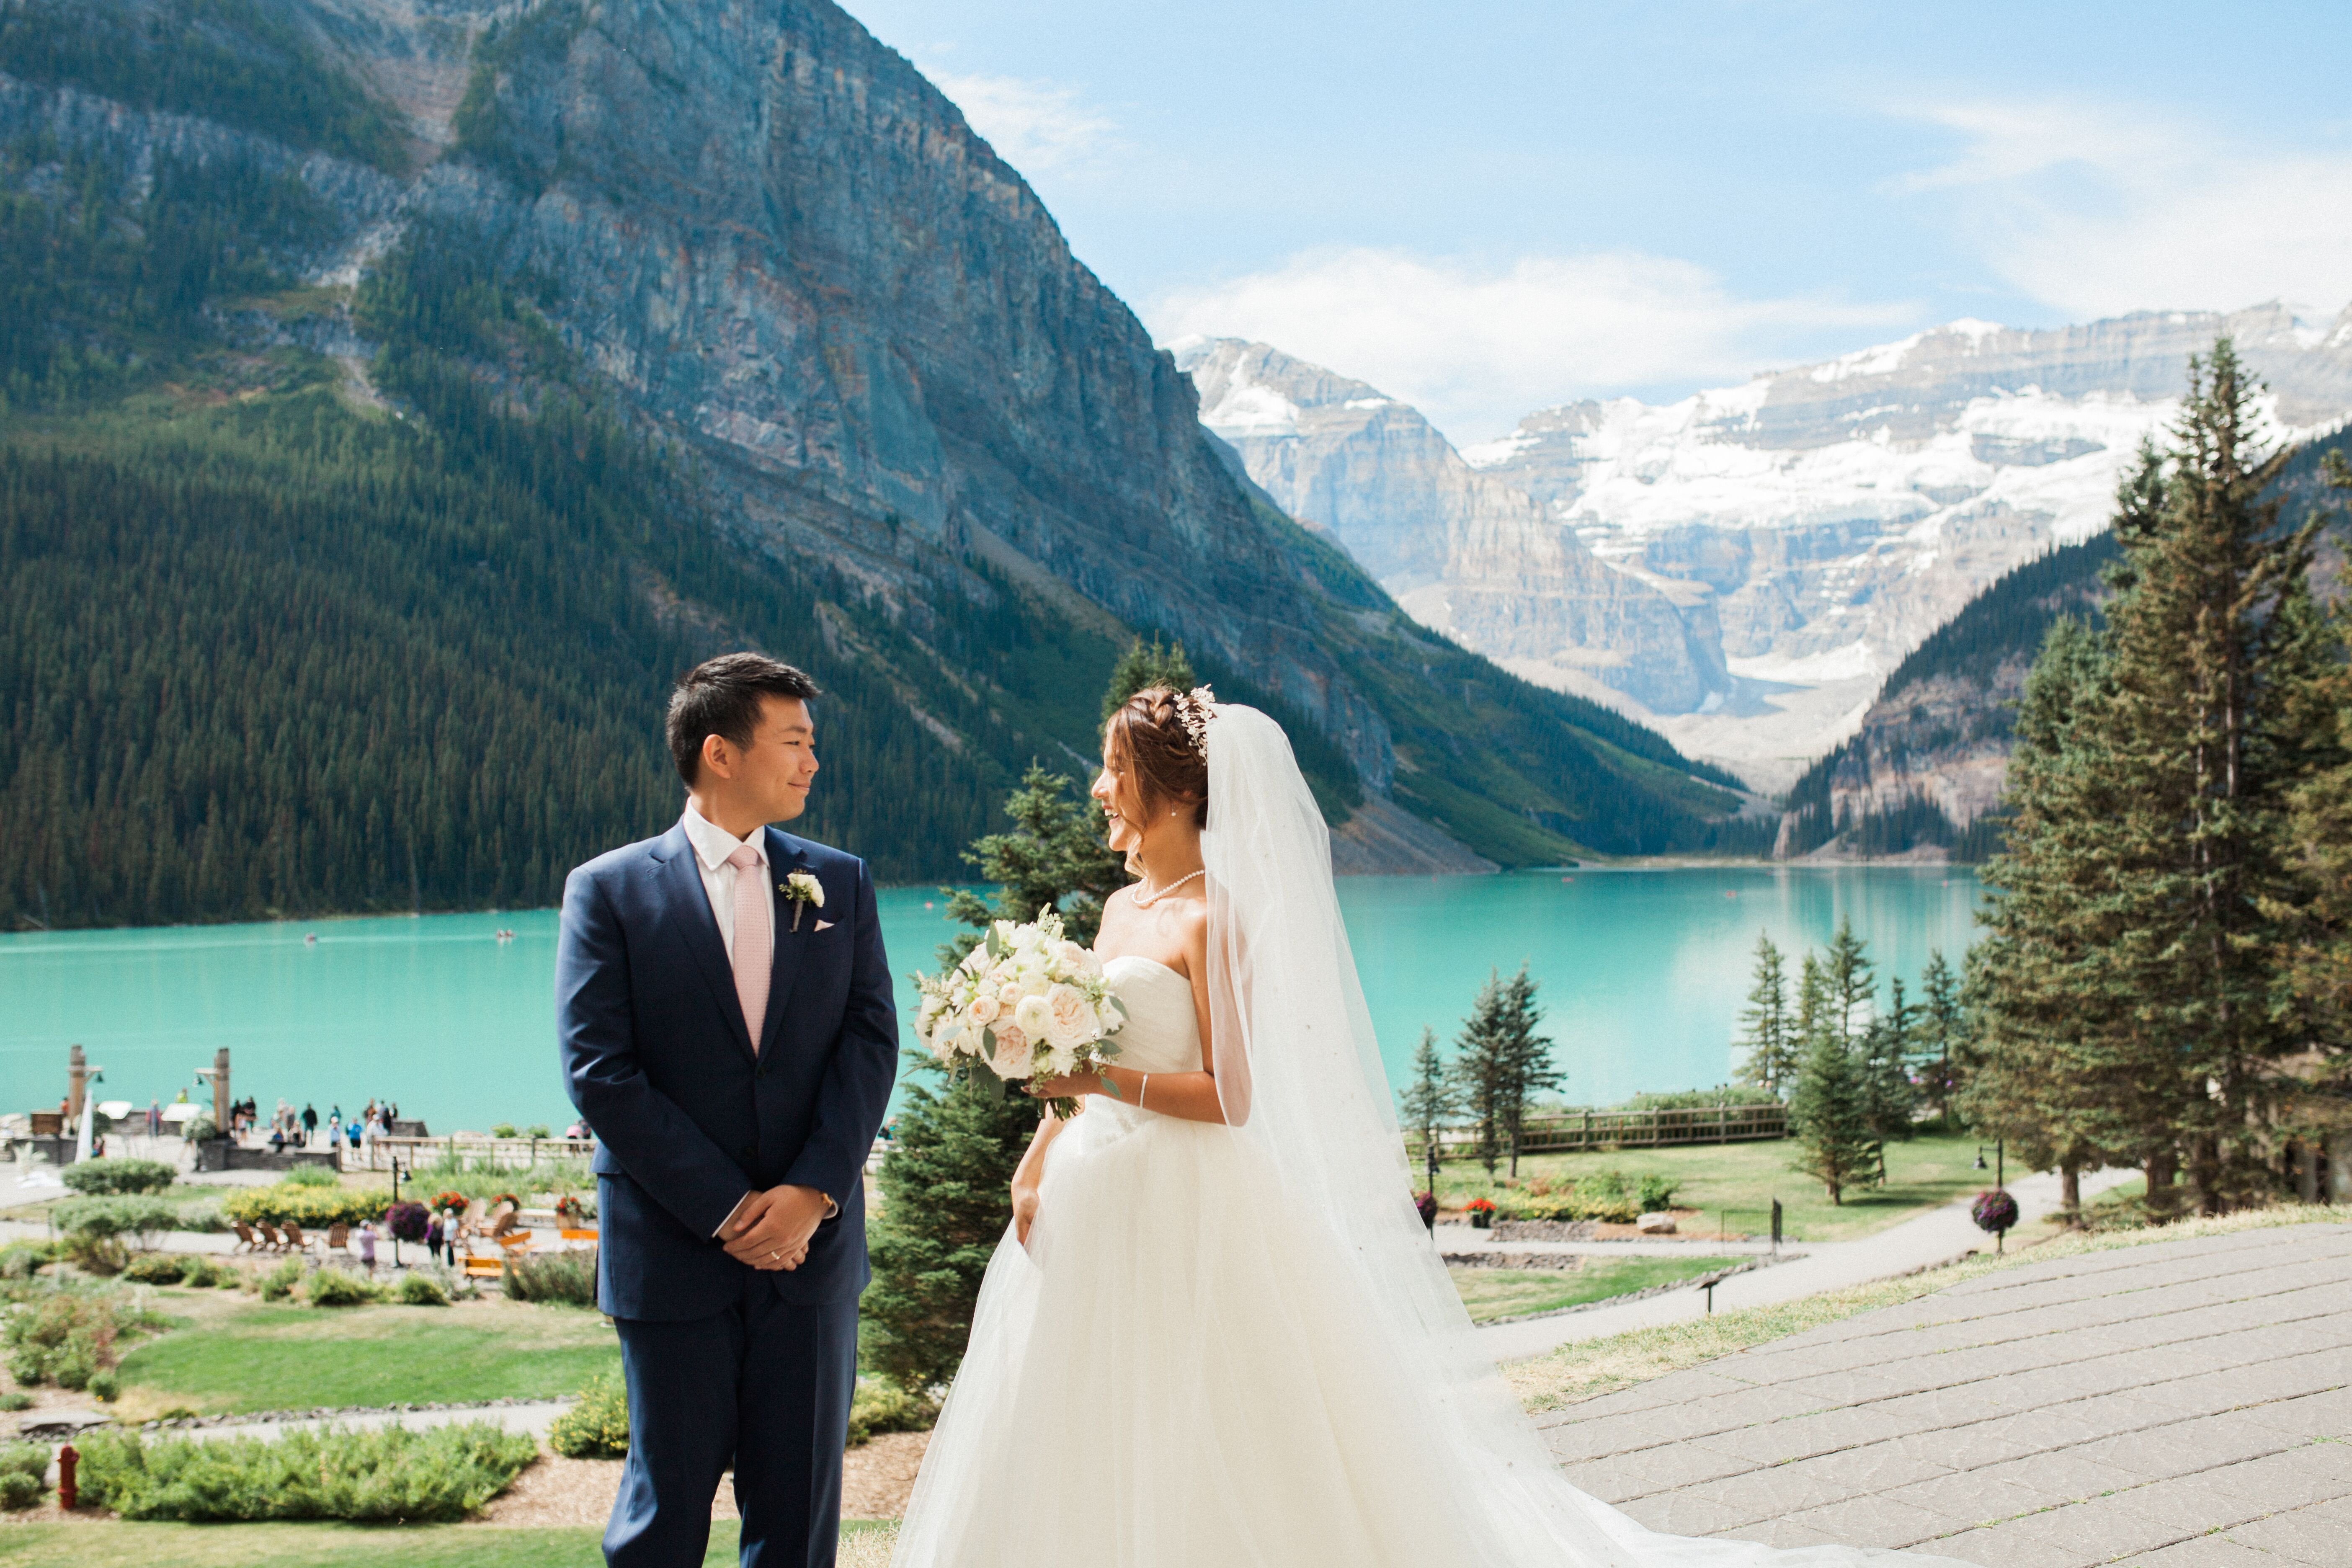 A Romantic, Classic Wedding At The Fairmont Chateau Lake